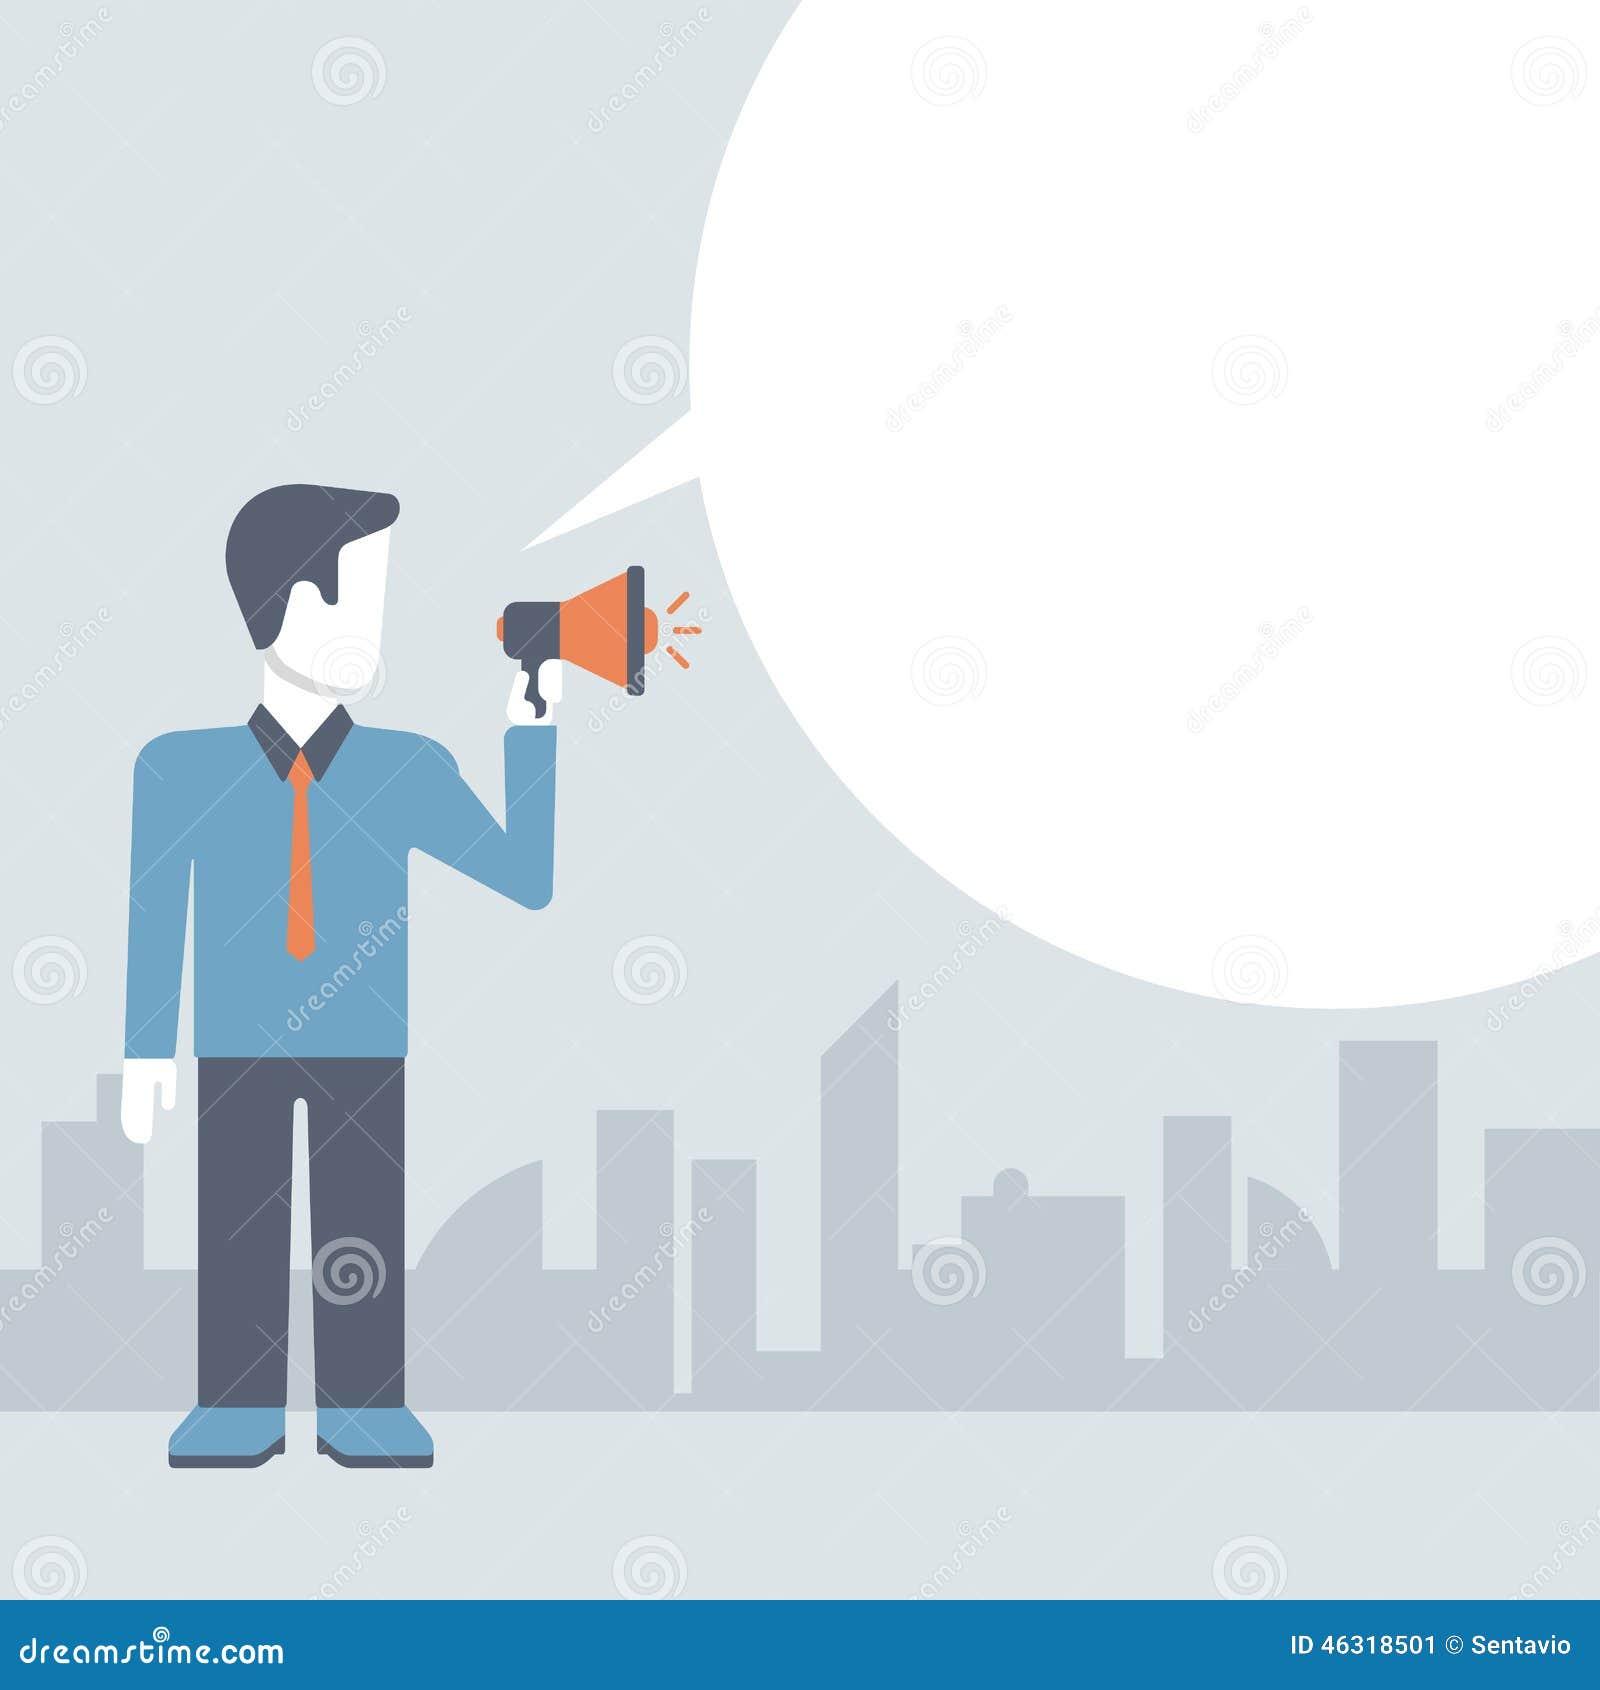 Businessman loudspeaker promotion concept comic flat template